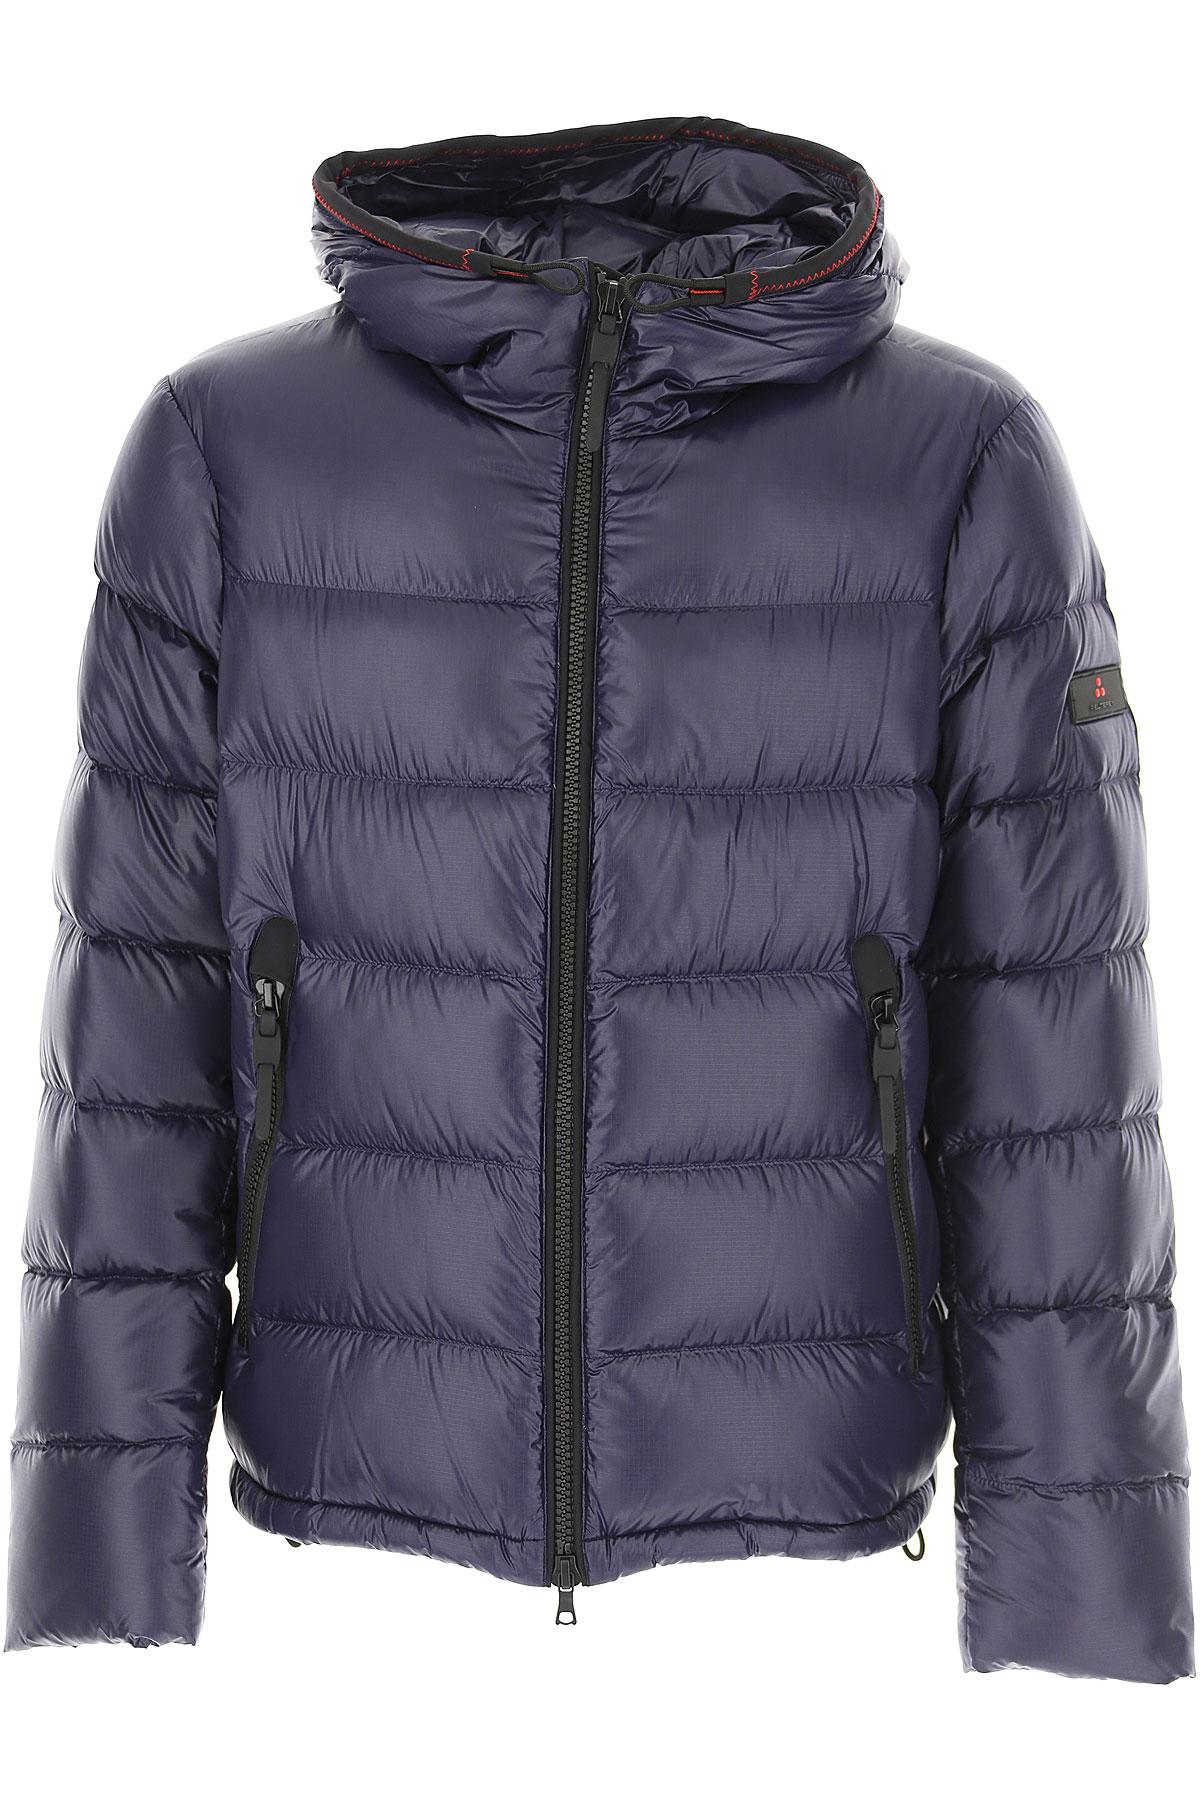 Peuterey Down Jacket for Men, Puffer Ski Jacket On Sale, Dark Blue, Down, 2019, L M